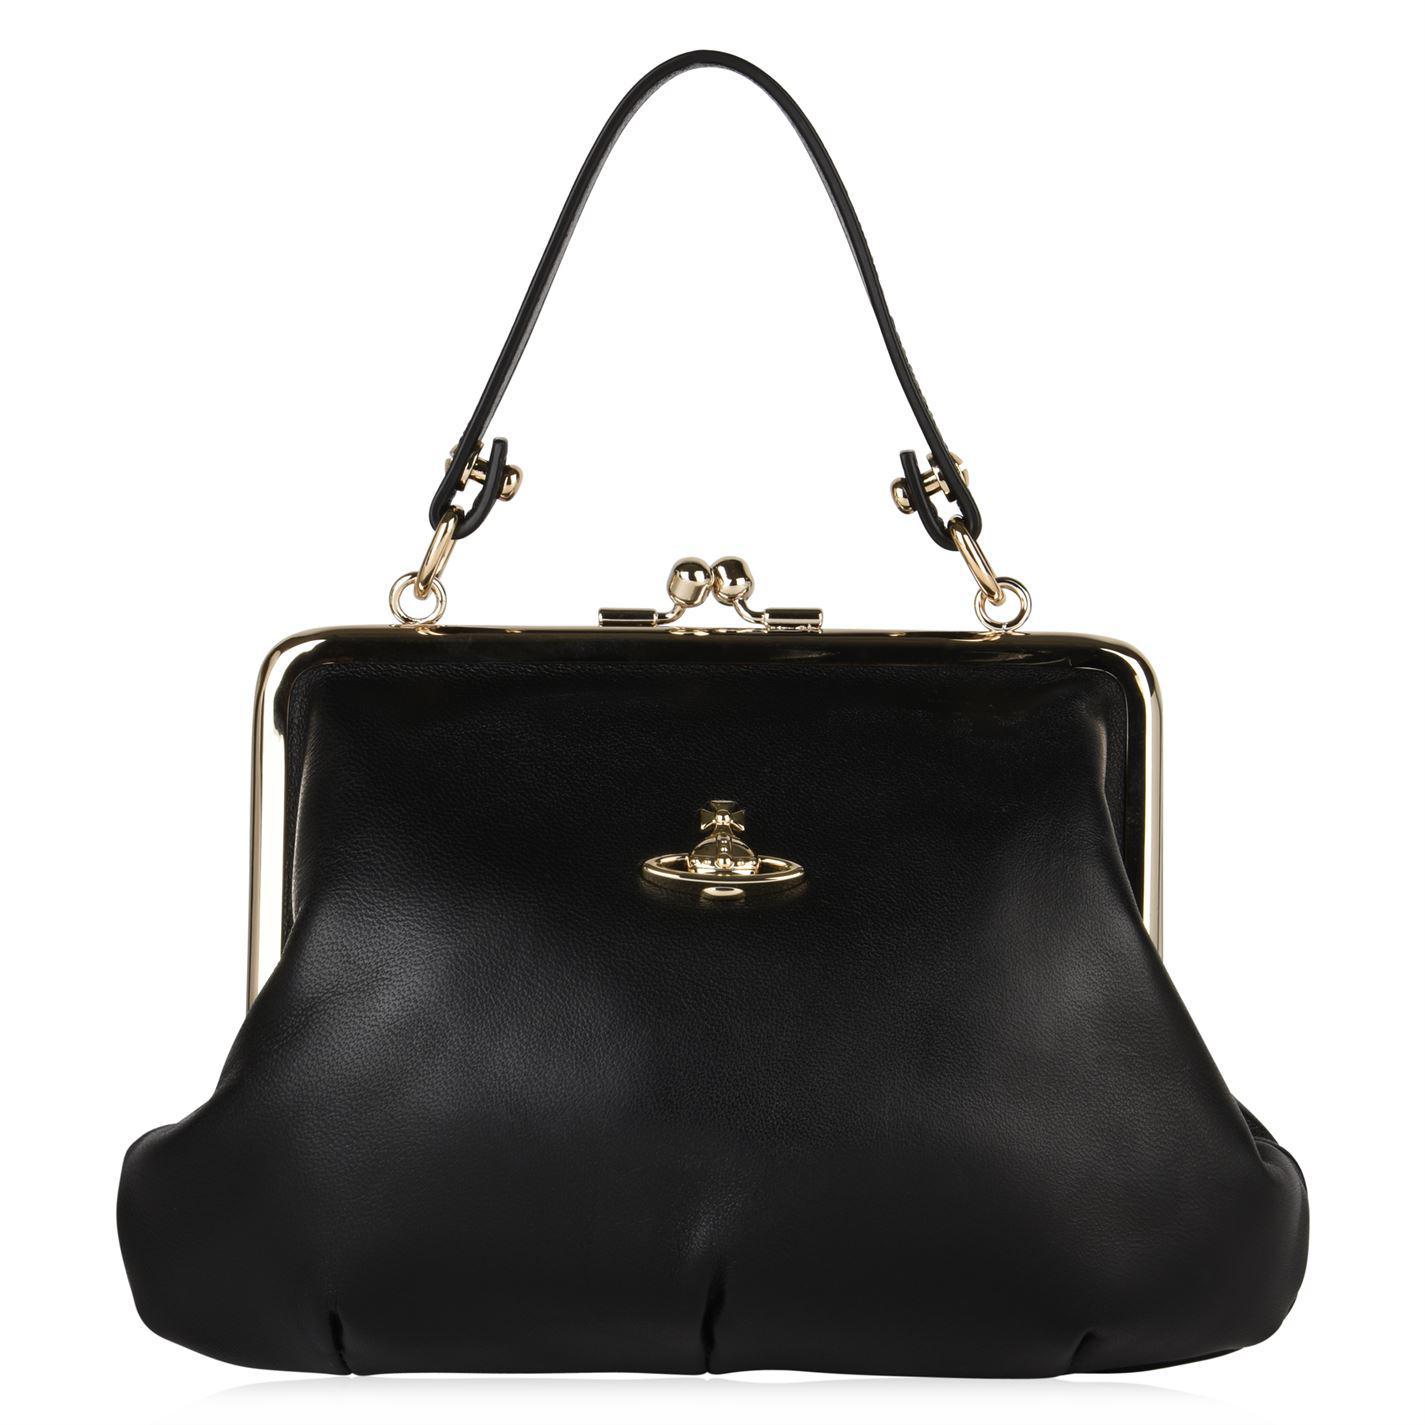 3e04488e2d4 Vivienne Westwood Emma Frame Purse Bag in Black - Lyst